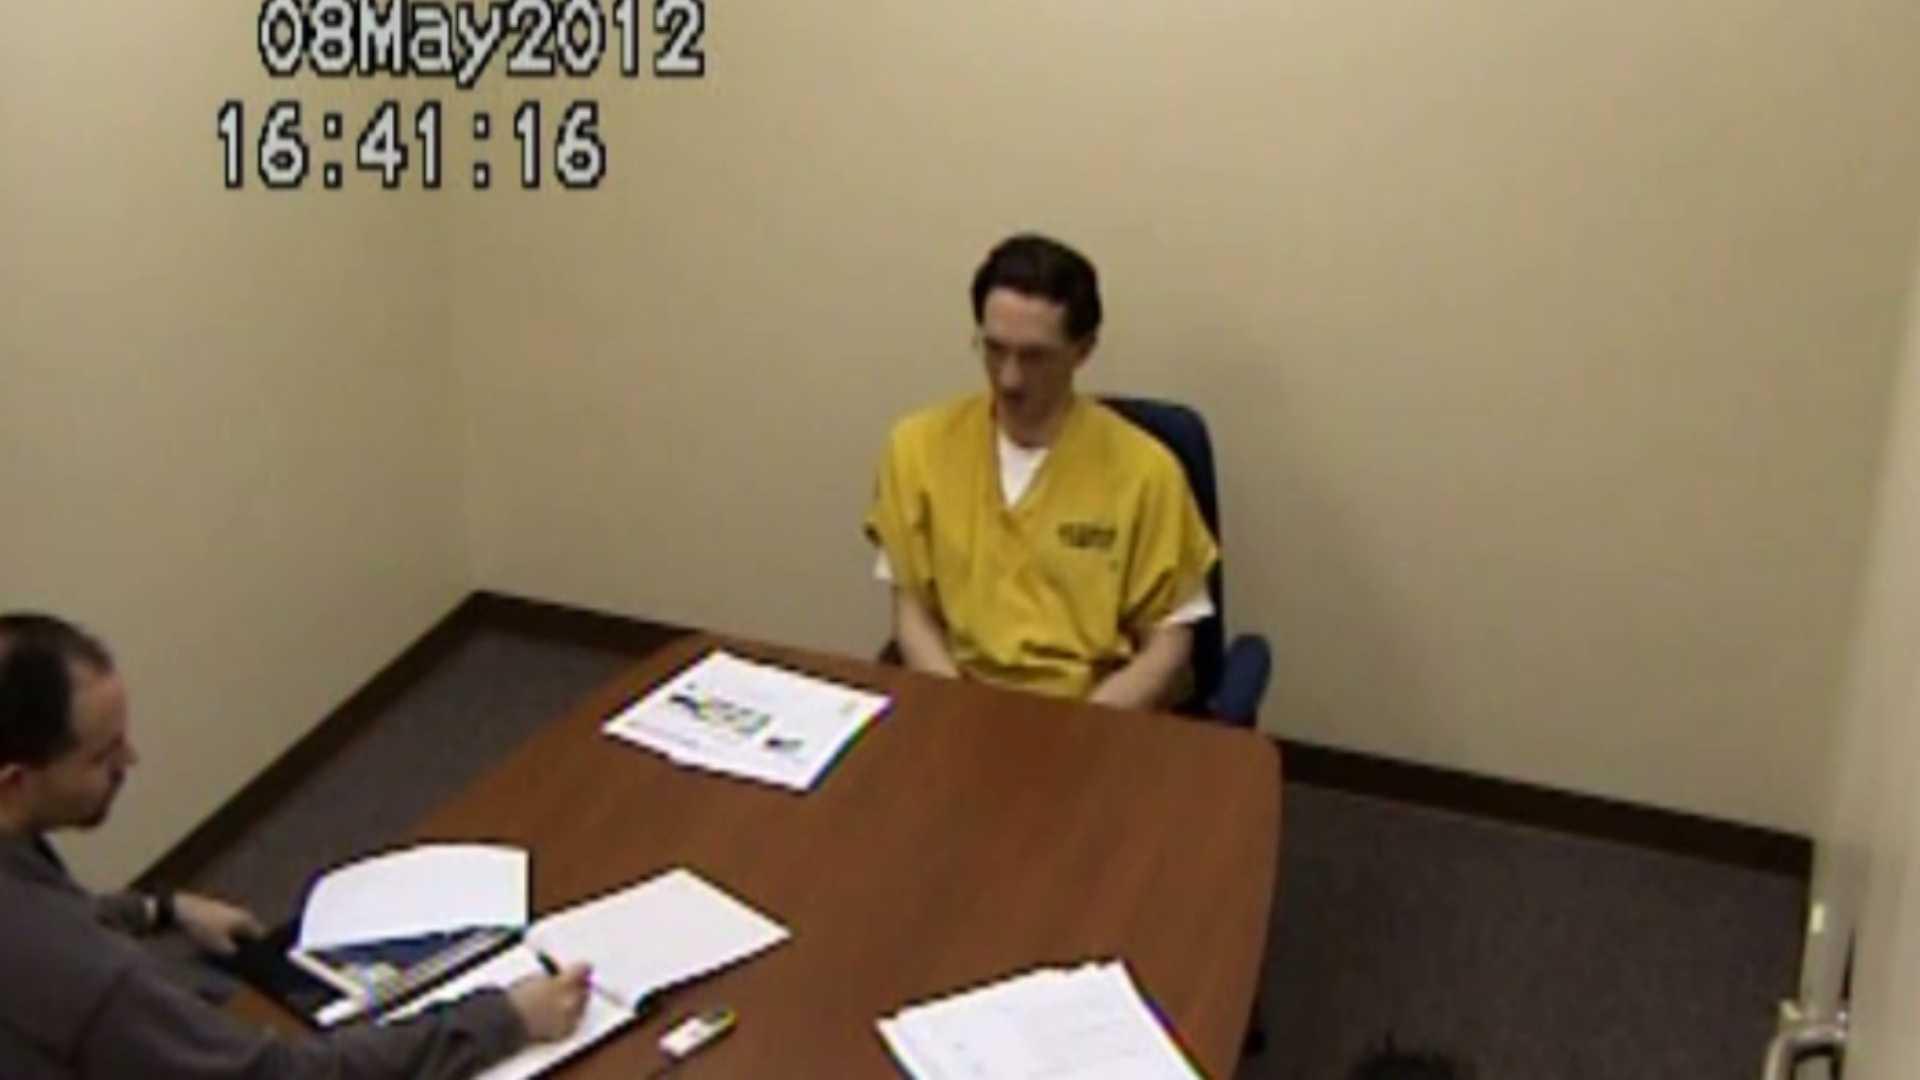 121112 Investigators talk Keyes case as new video, audio emerge - img